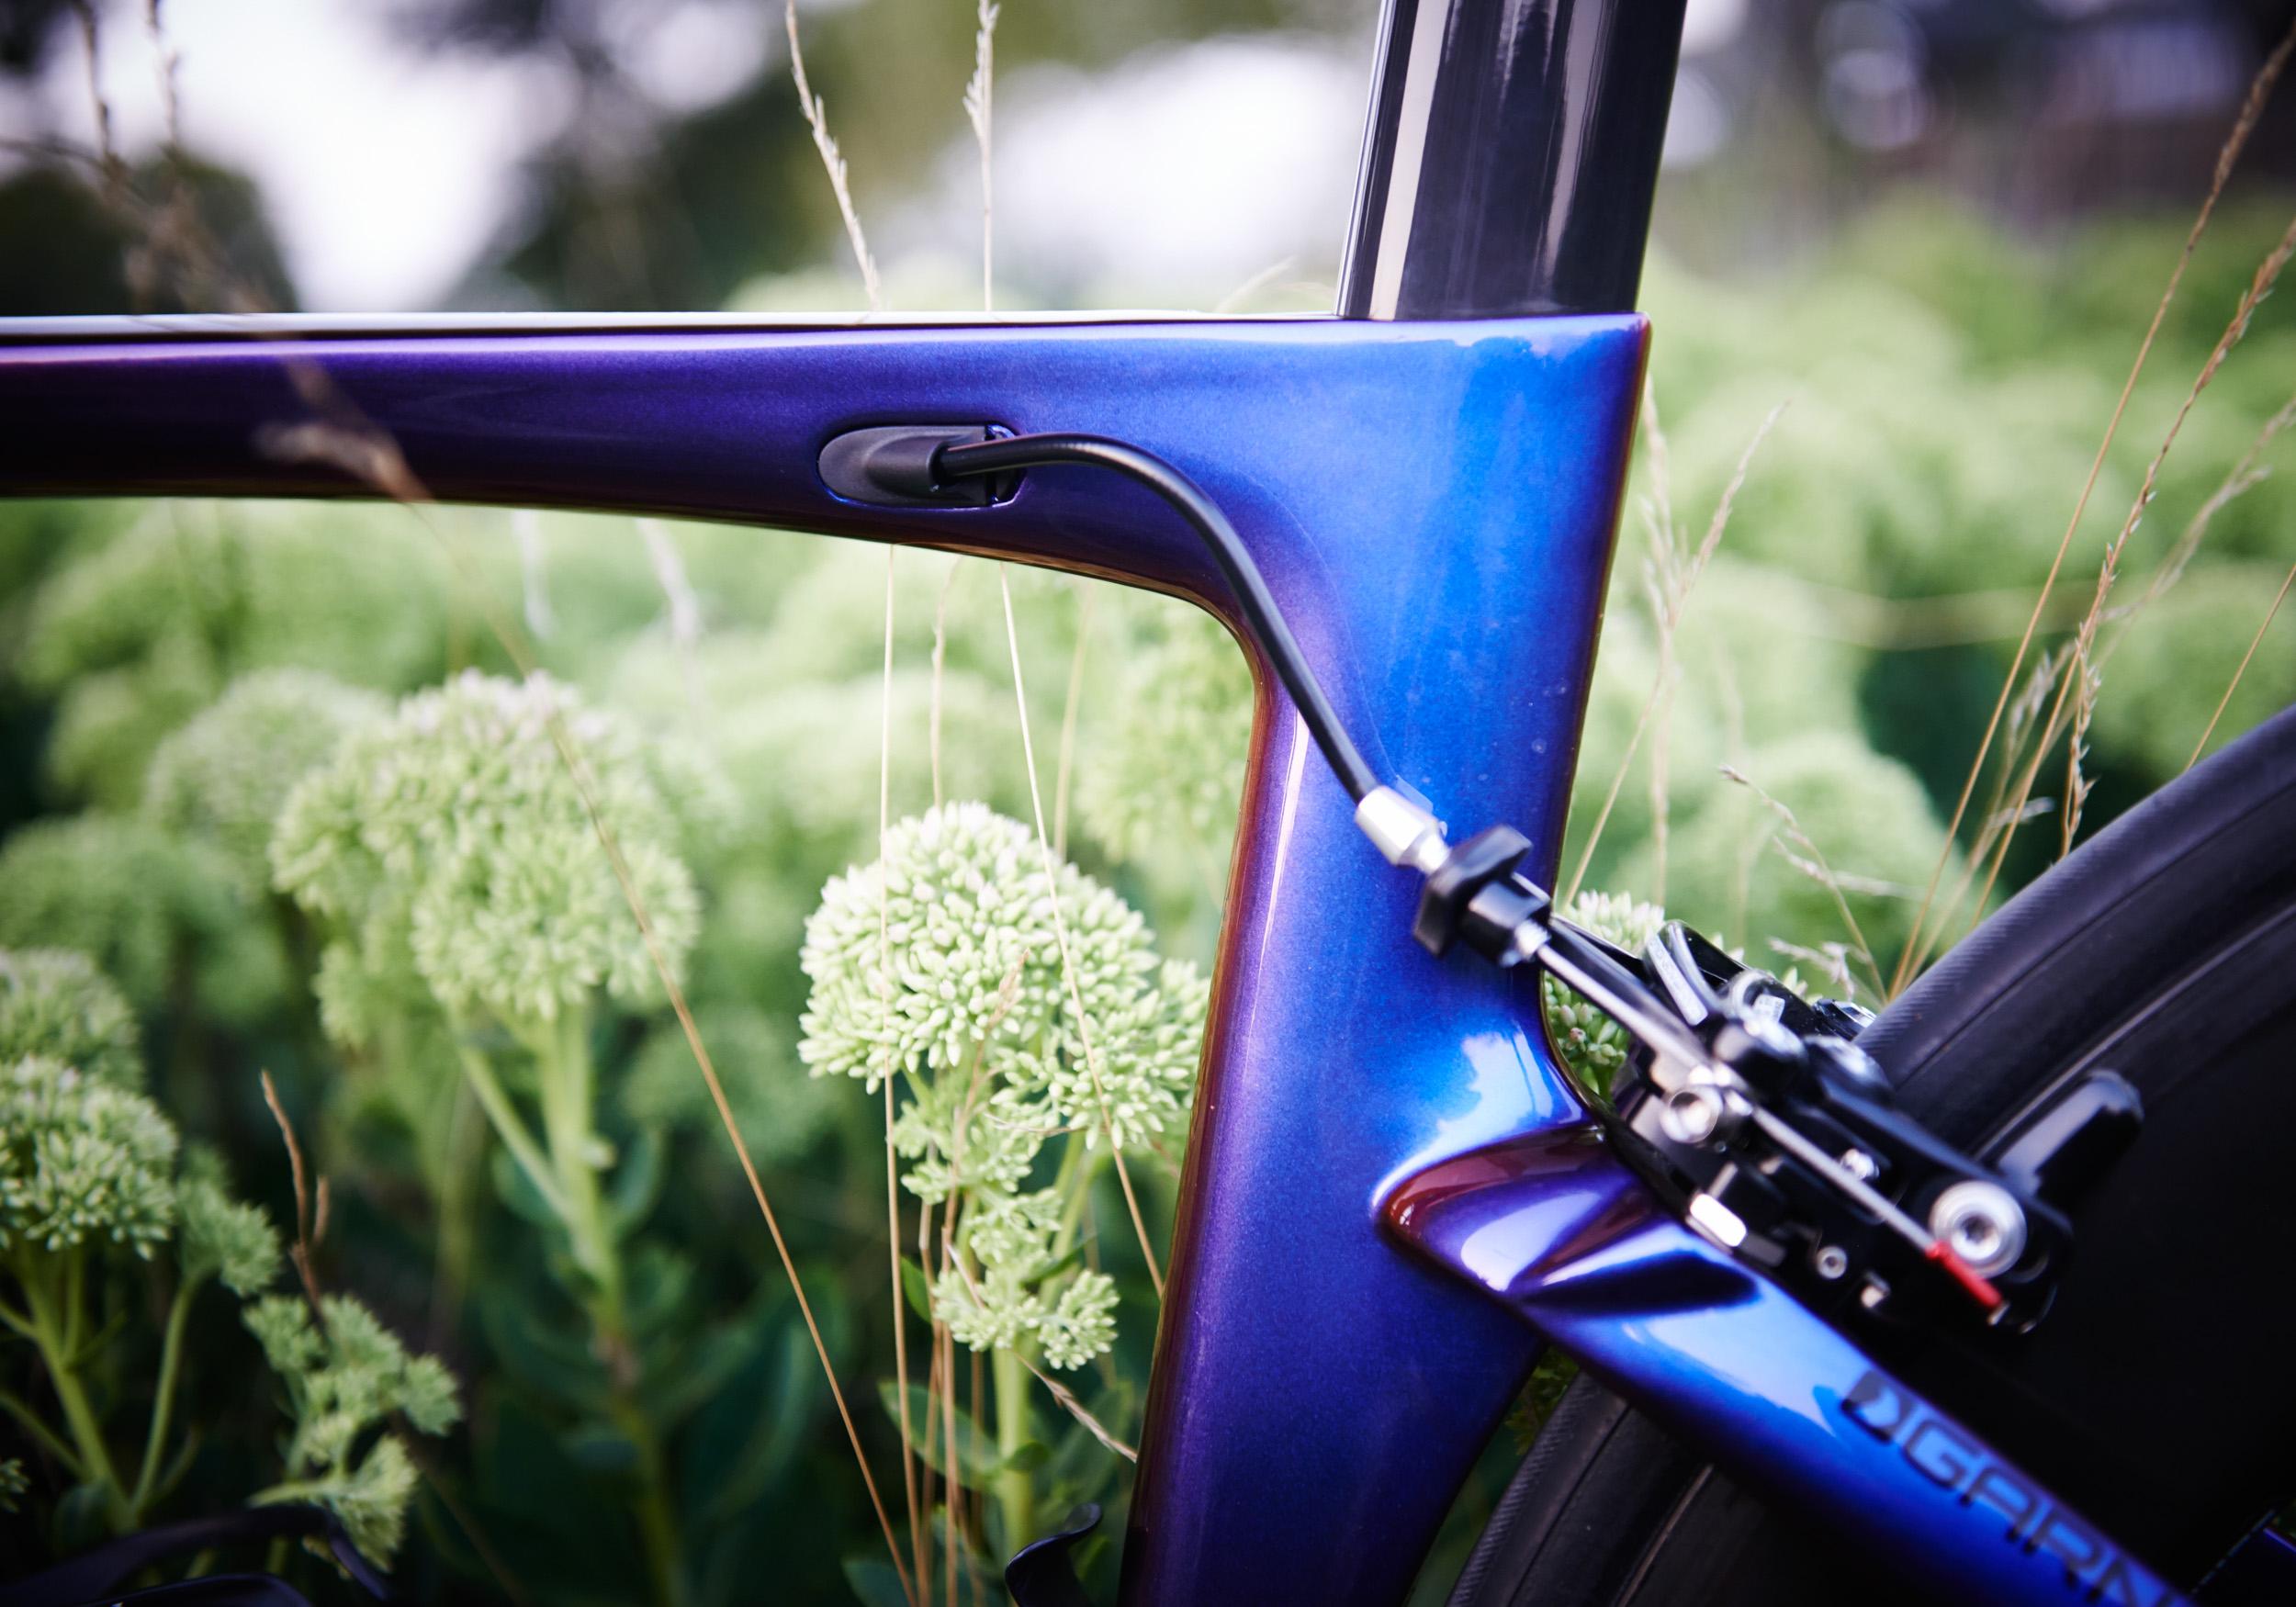 to-be-determined-garneau-a1-bike-review-118.jpg